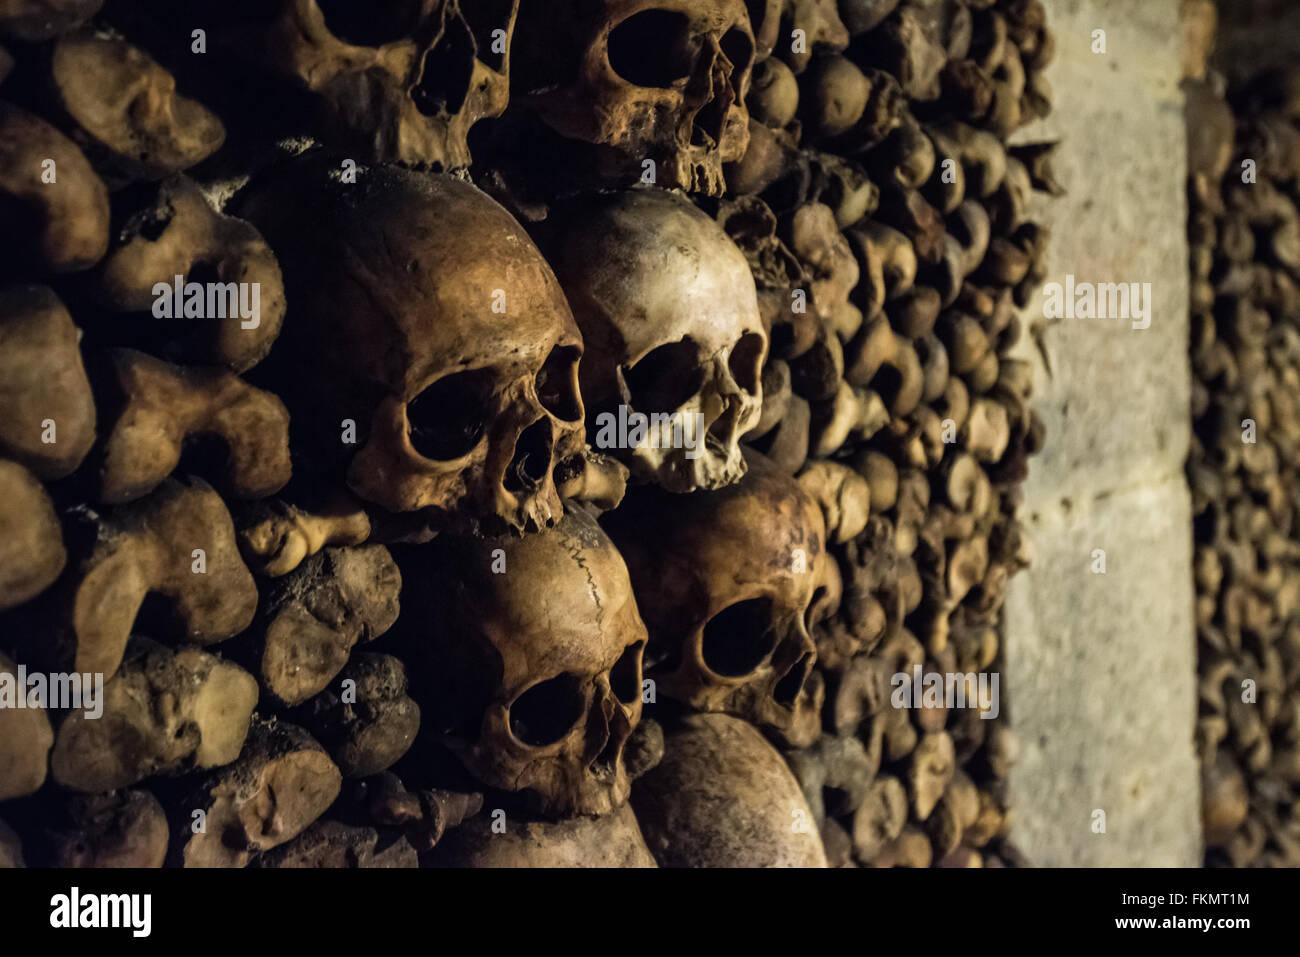 Skulls and bones in Paris Catacombs - Stock Image